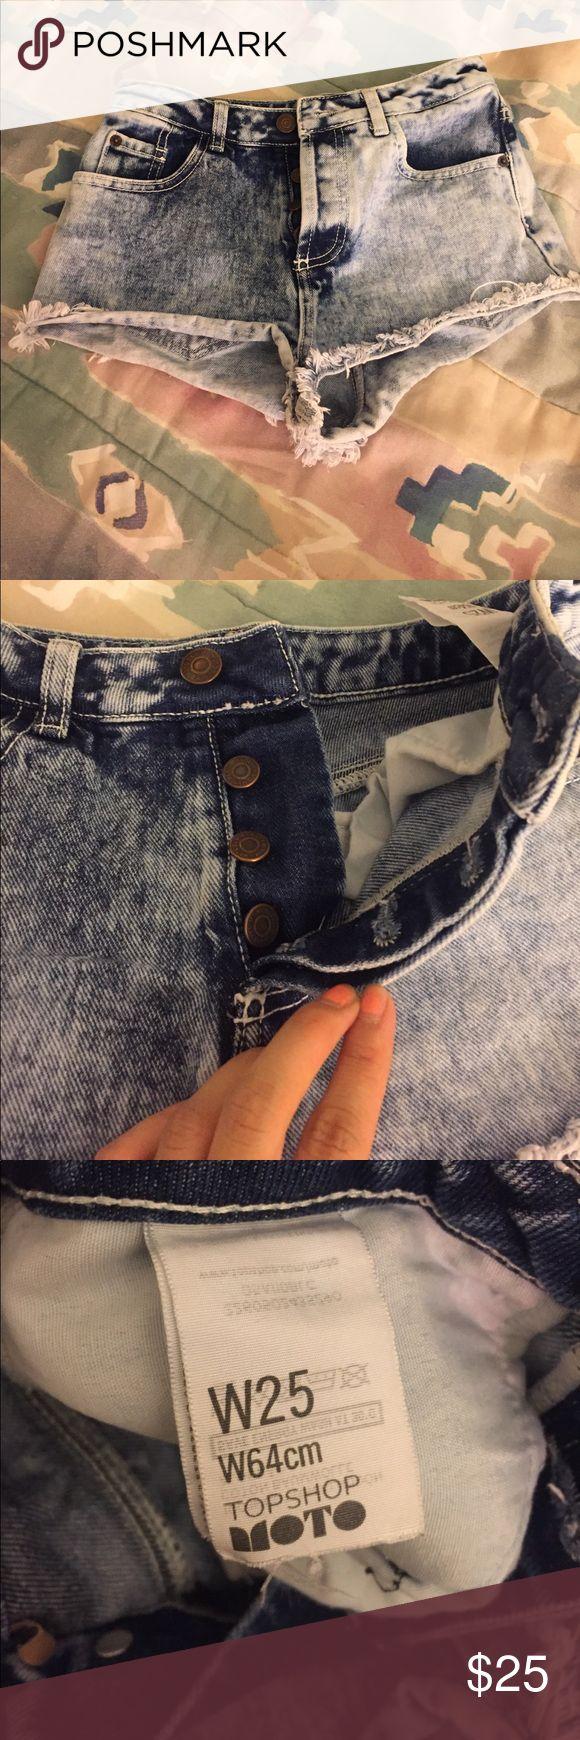 Topshop Moto acid wash denim cut off jean shorts Size 25. EUC excellent used condition topshop moto light blue denim jean cut off shorts. Super cute and button fly! Topshop Shorts Jean Shorts